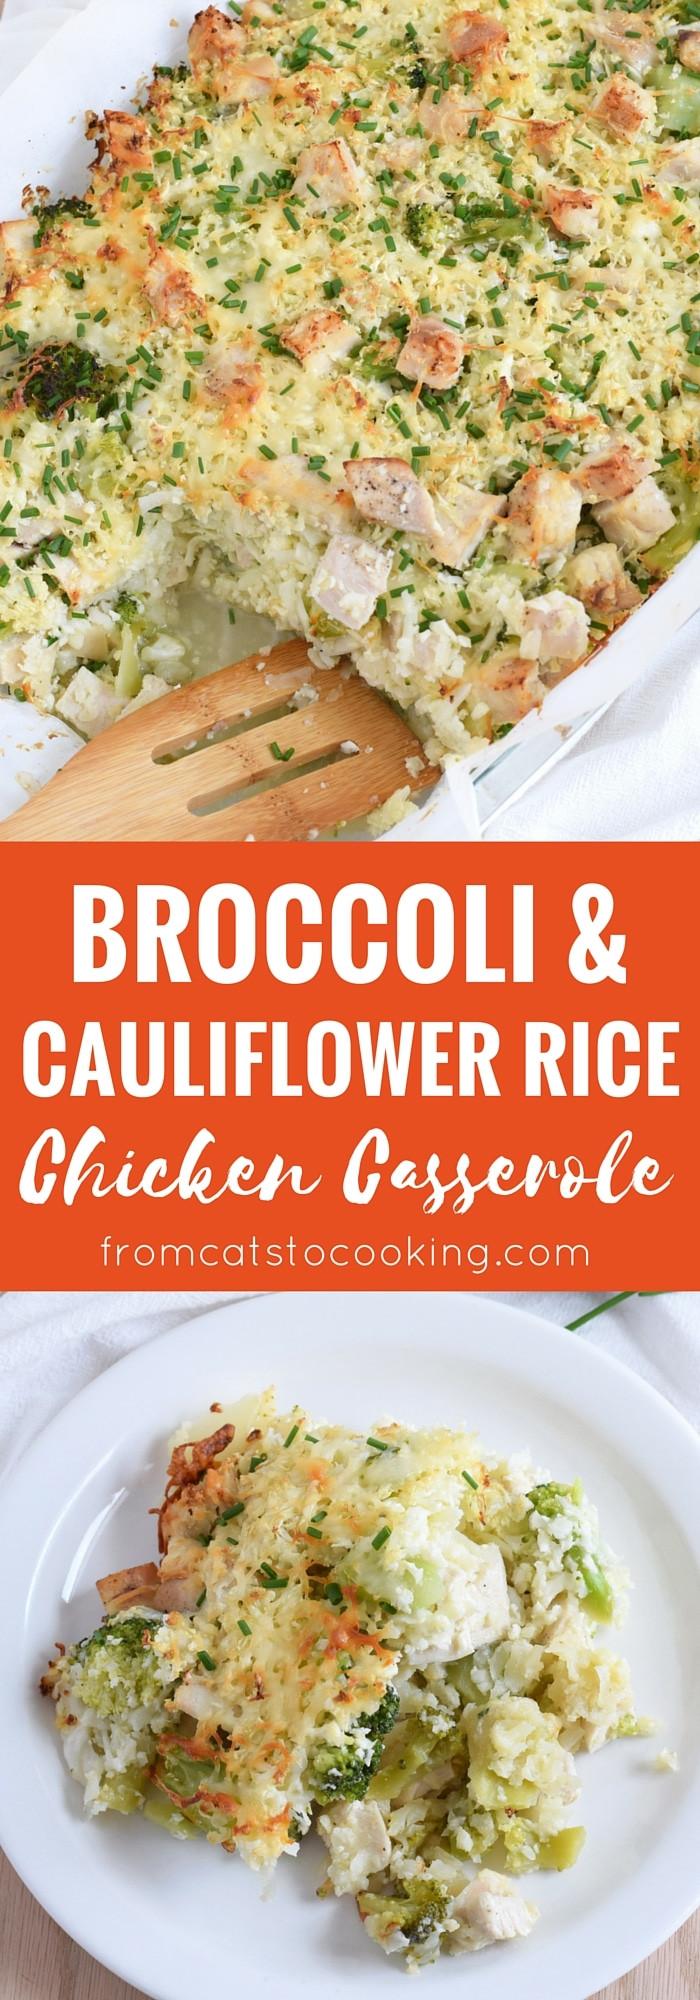 Healthy Broccoli And Rice Casserole  Broccoli & Cauliflower Rice Chicken Casserole Isabel Eats